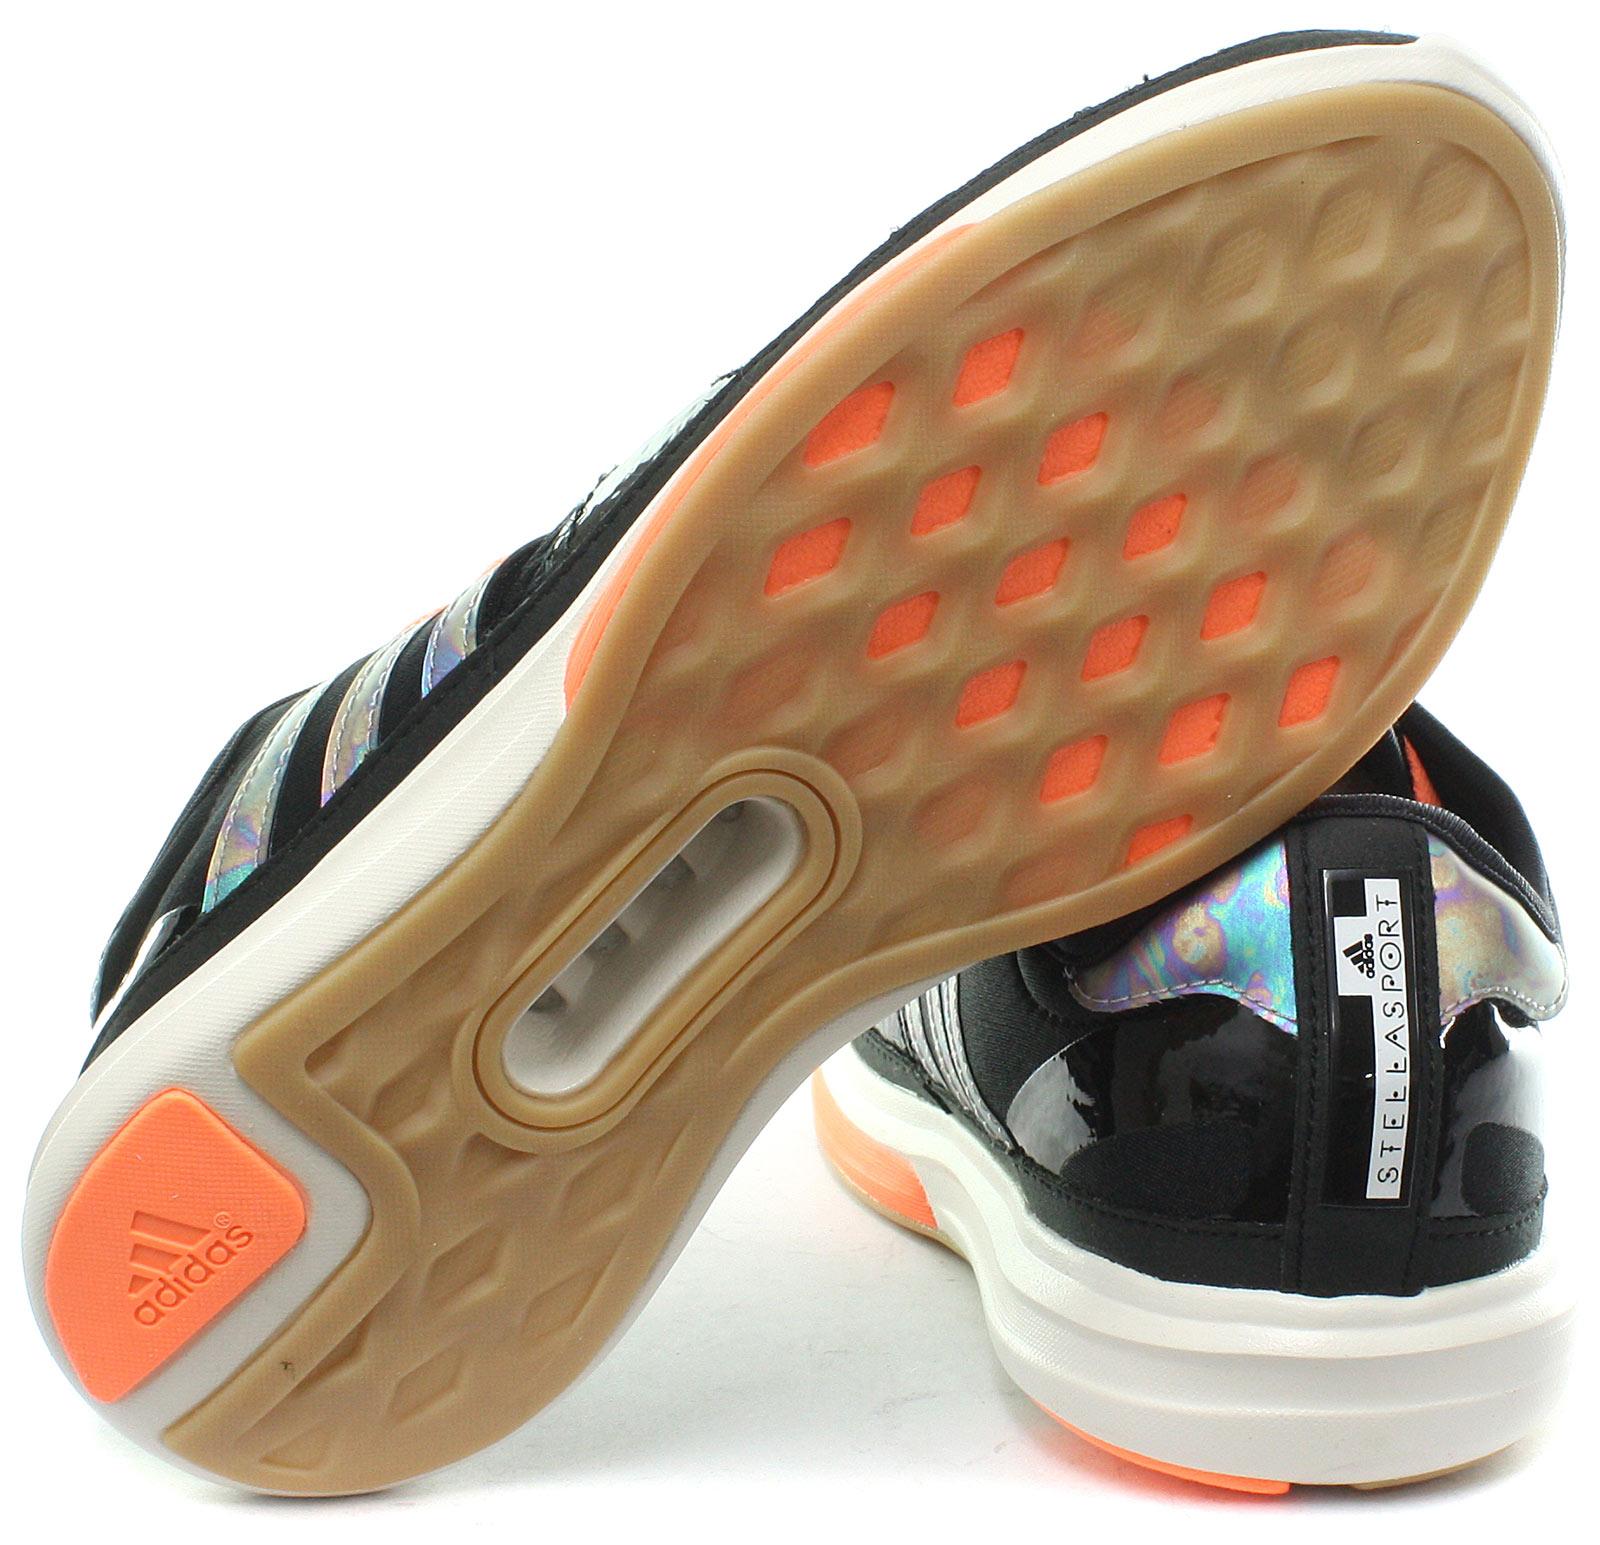 New adidas Stella McCartney ALL Yvori Womens Training Shoes ALL McCartney SIZES abf3ad